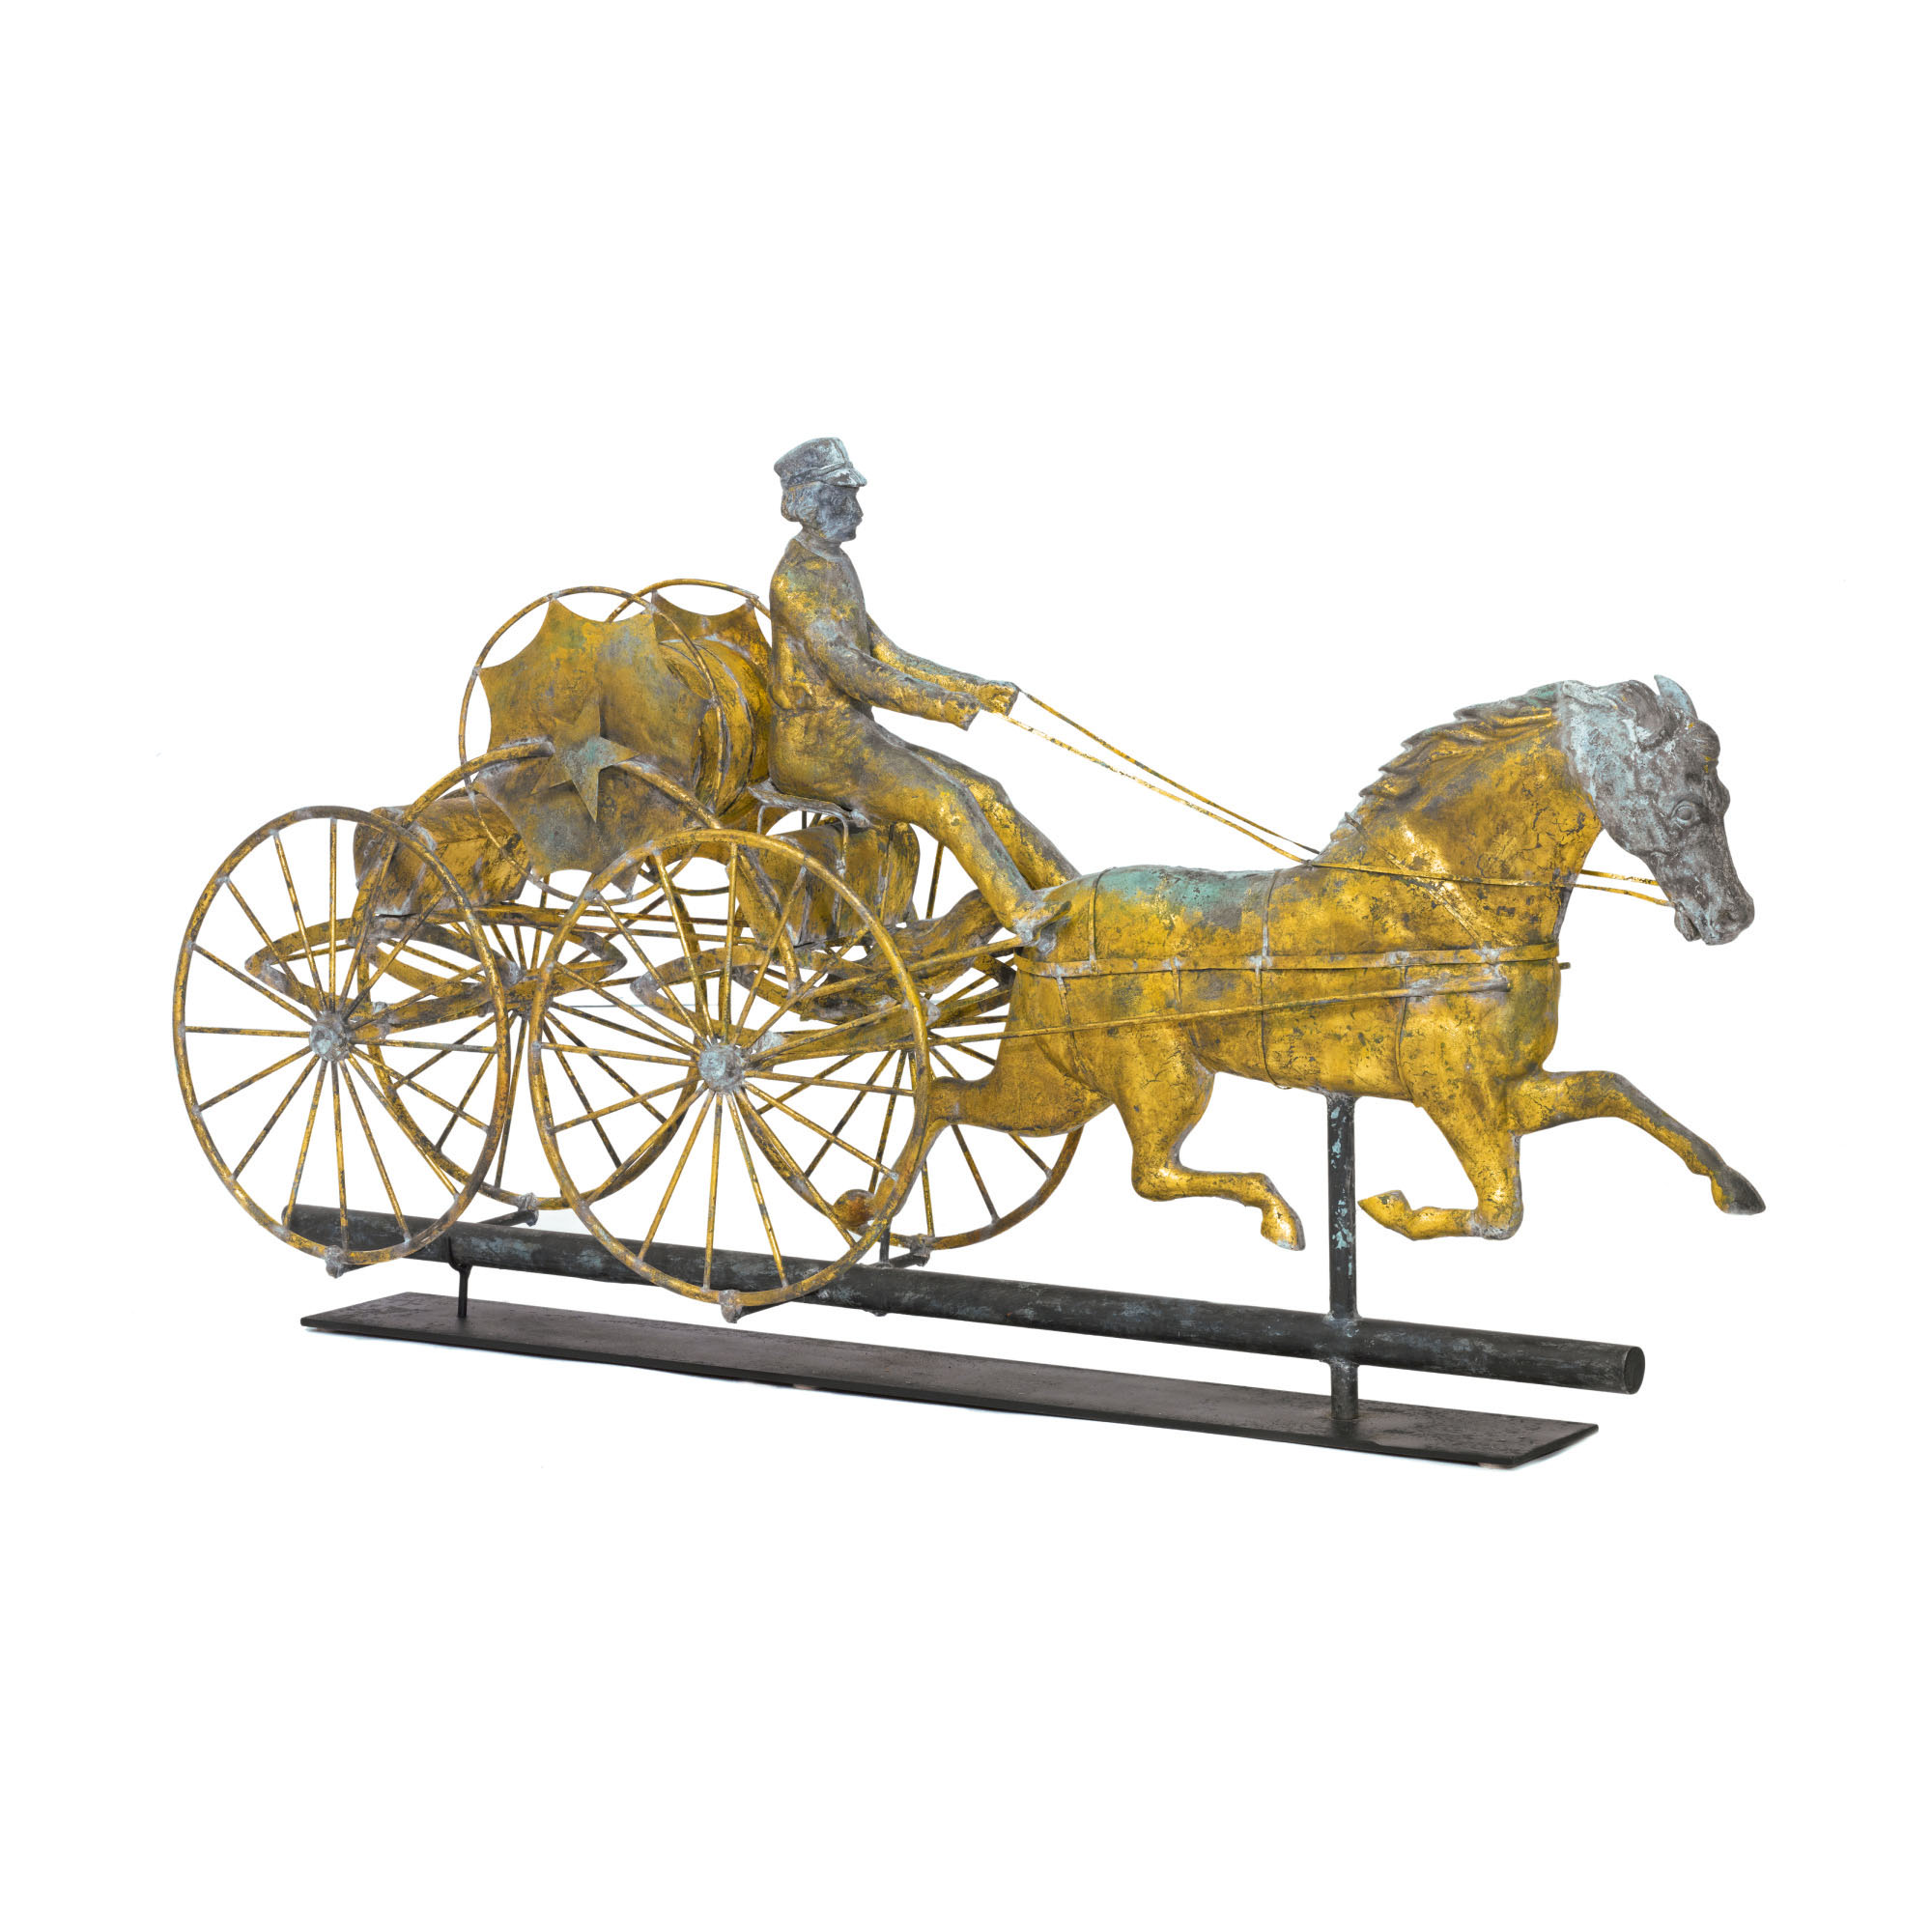 VERY FINE AND RARE GILT MOLDED SHEET COPPER AND ZINC FIRE PUMPER AND HORSE WEATHERVANE, B. HARRIS & CO, BOSTON, MASSACHUSETTS, CIRCA 1885